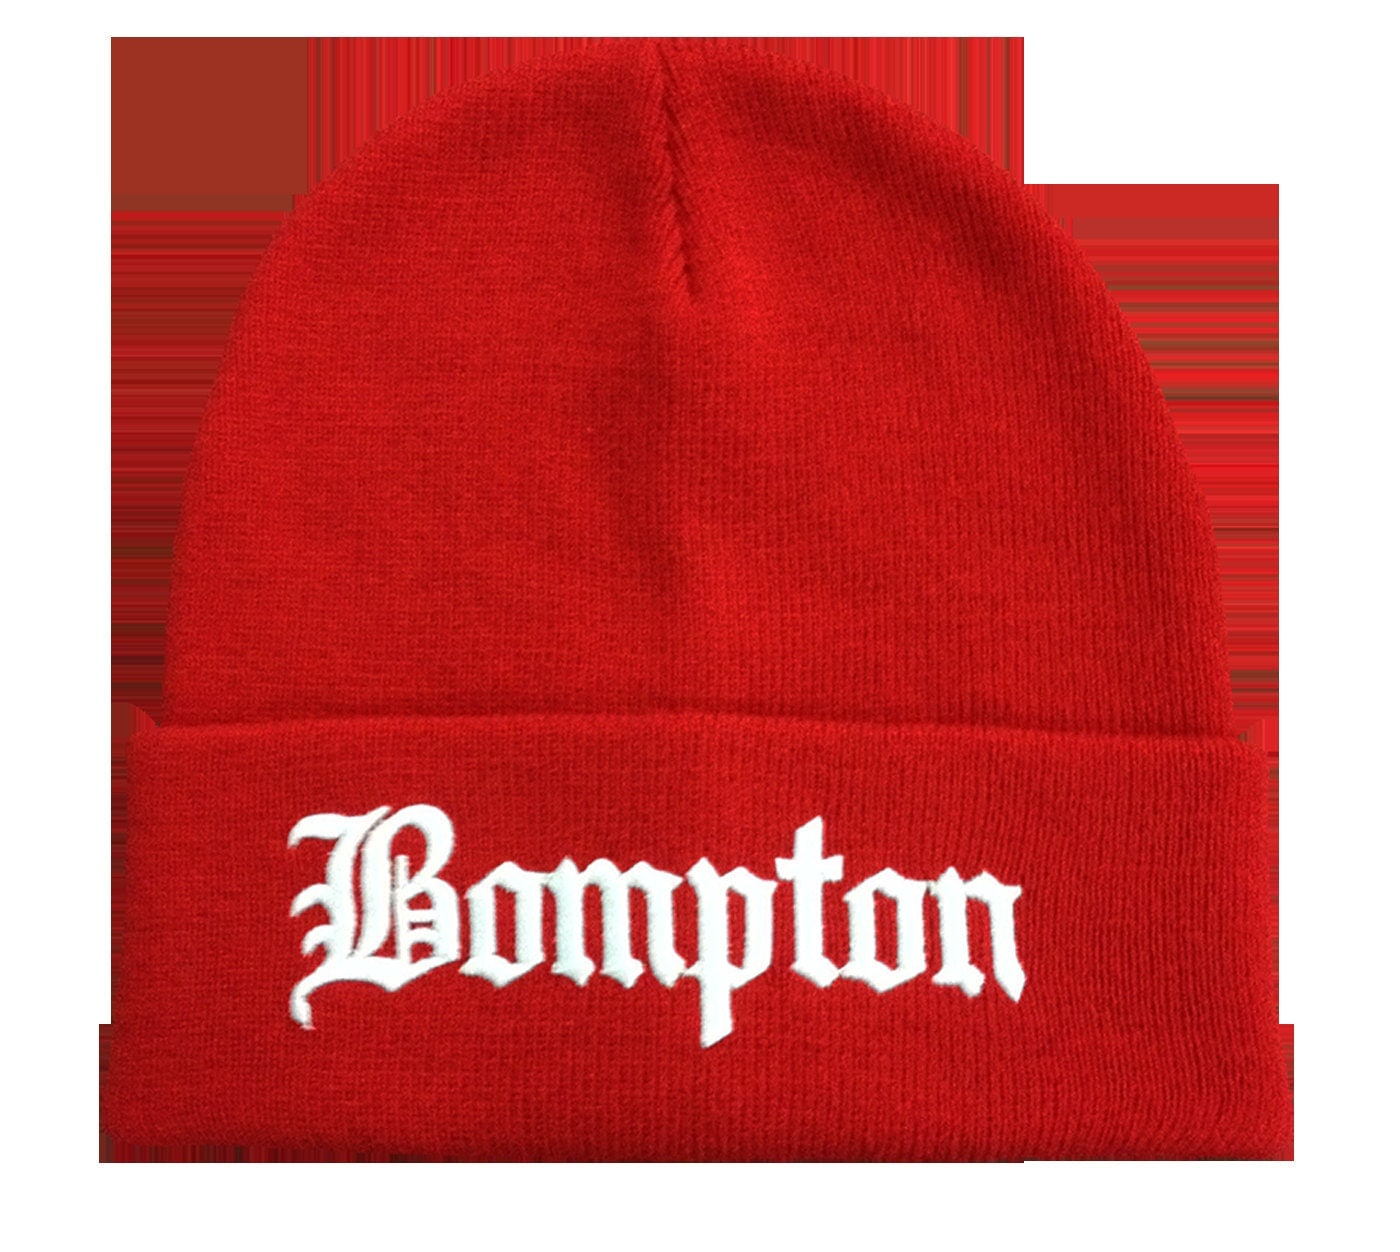 Bompton Hat: Red Bompton Beanie